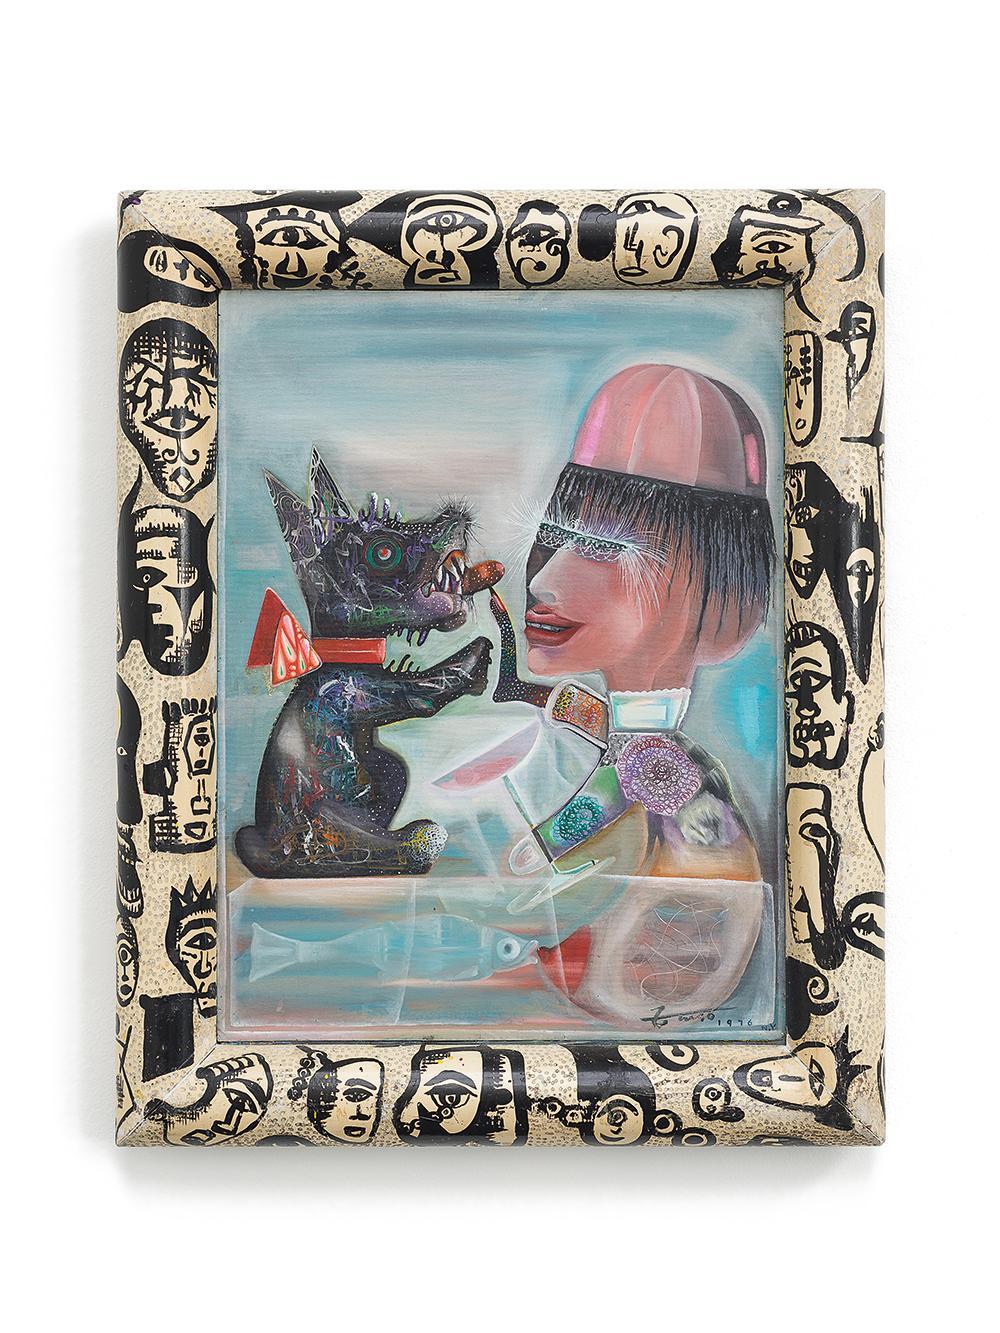 Finger Dog , 1976 Oil on frame, canvas mounted on board, 77 x 62 cm